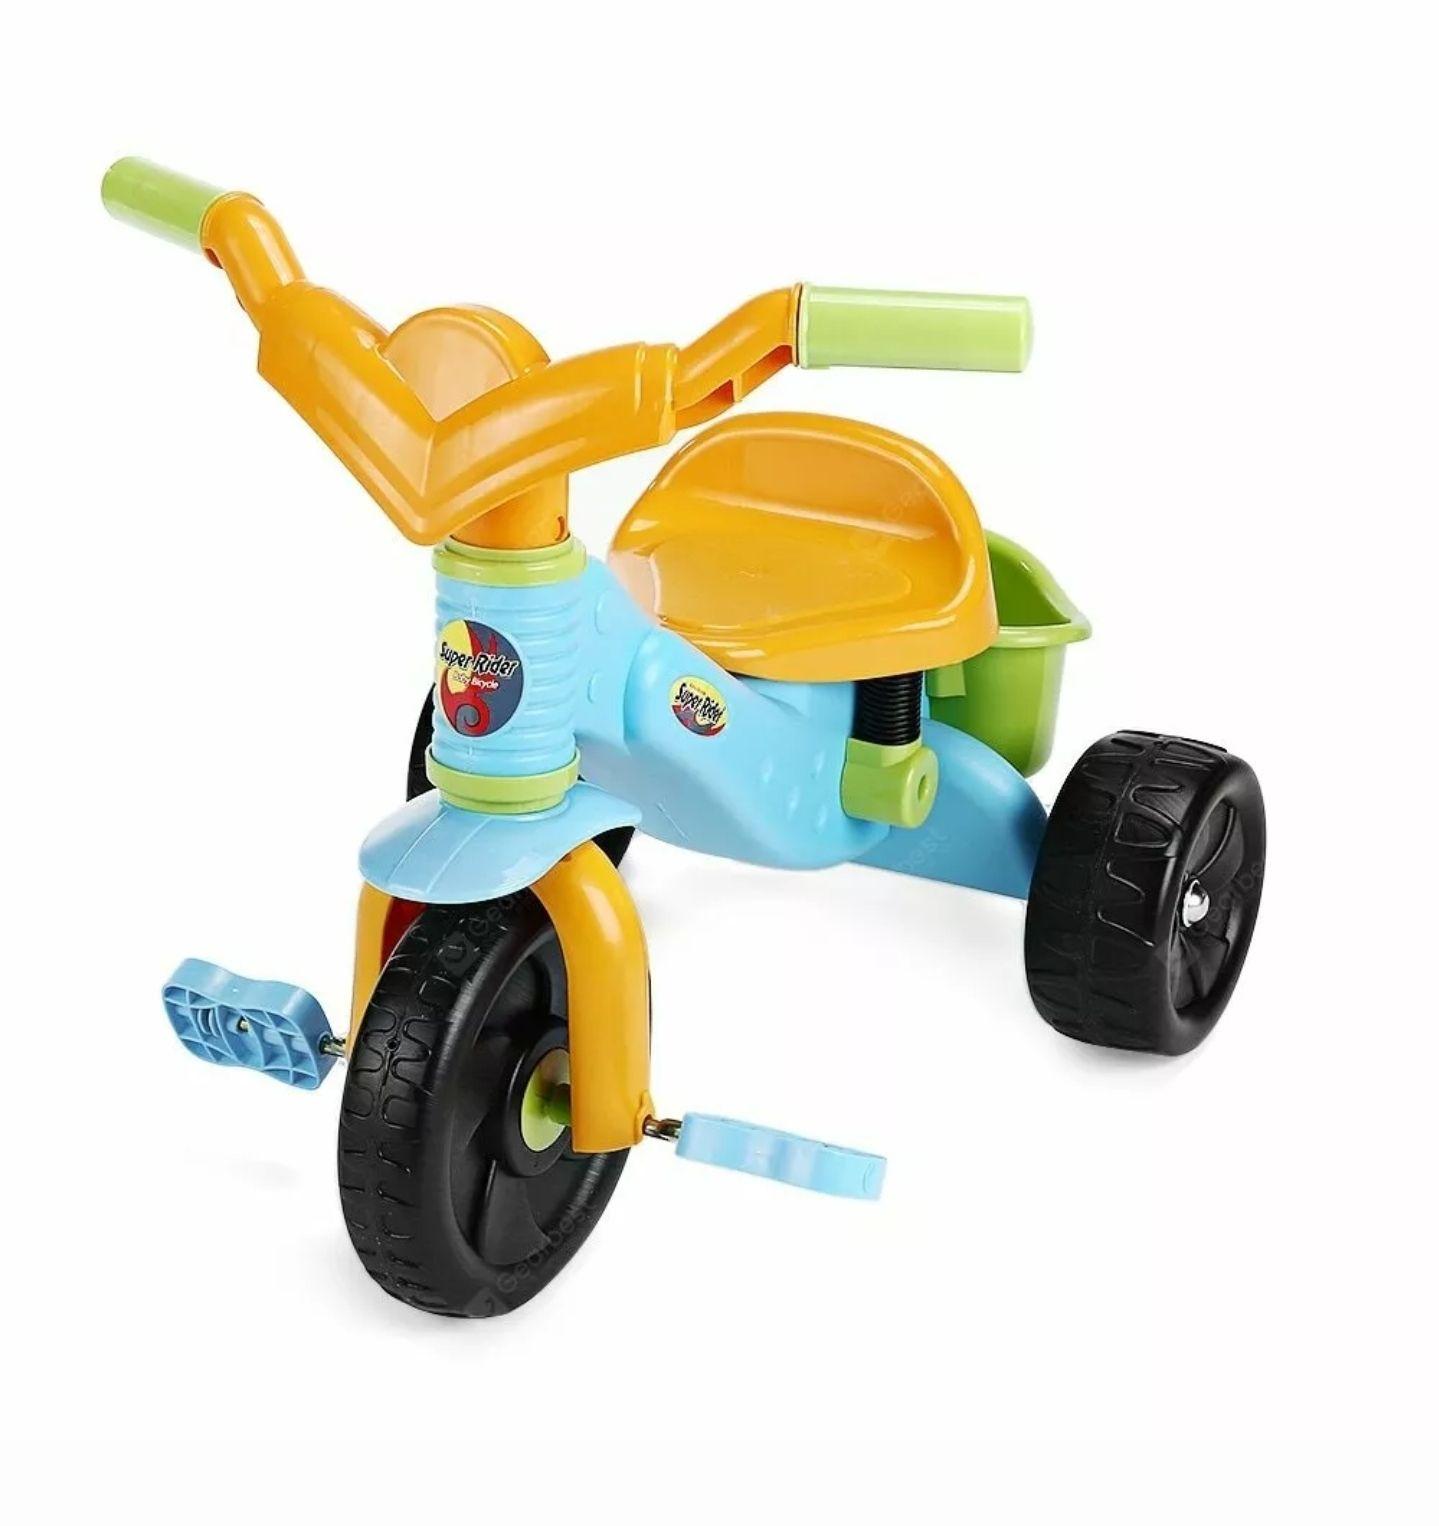 Virhuck Kids Tricycle Trike Children 3 Wheel Super Rider Rear With Basket at Ebay/Mason-Goods for £12.99